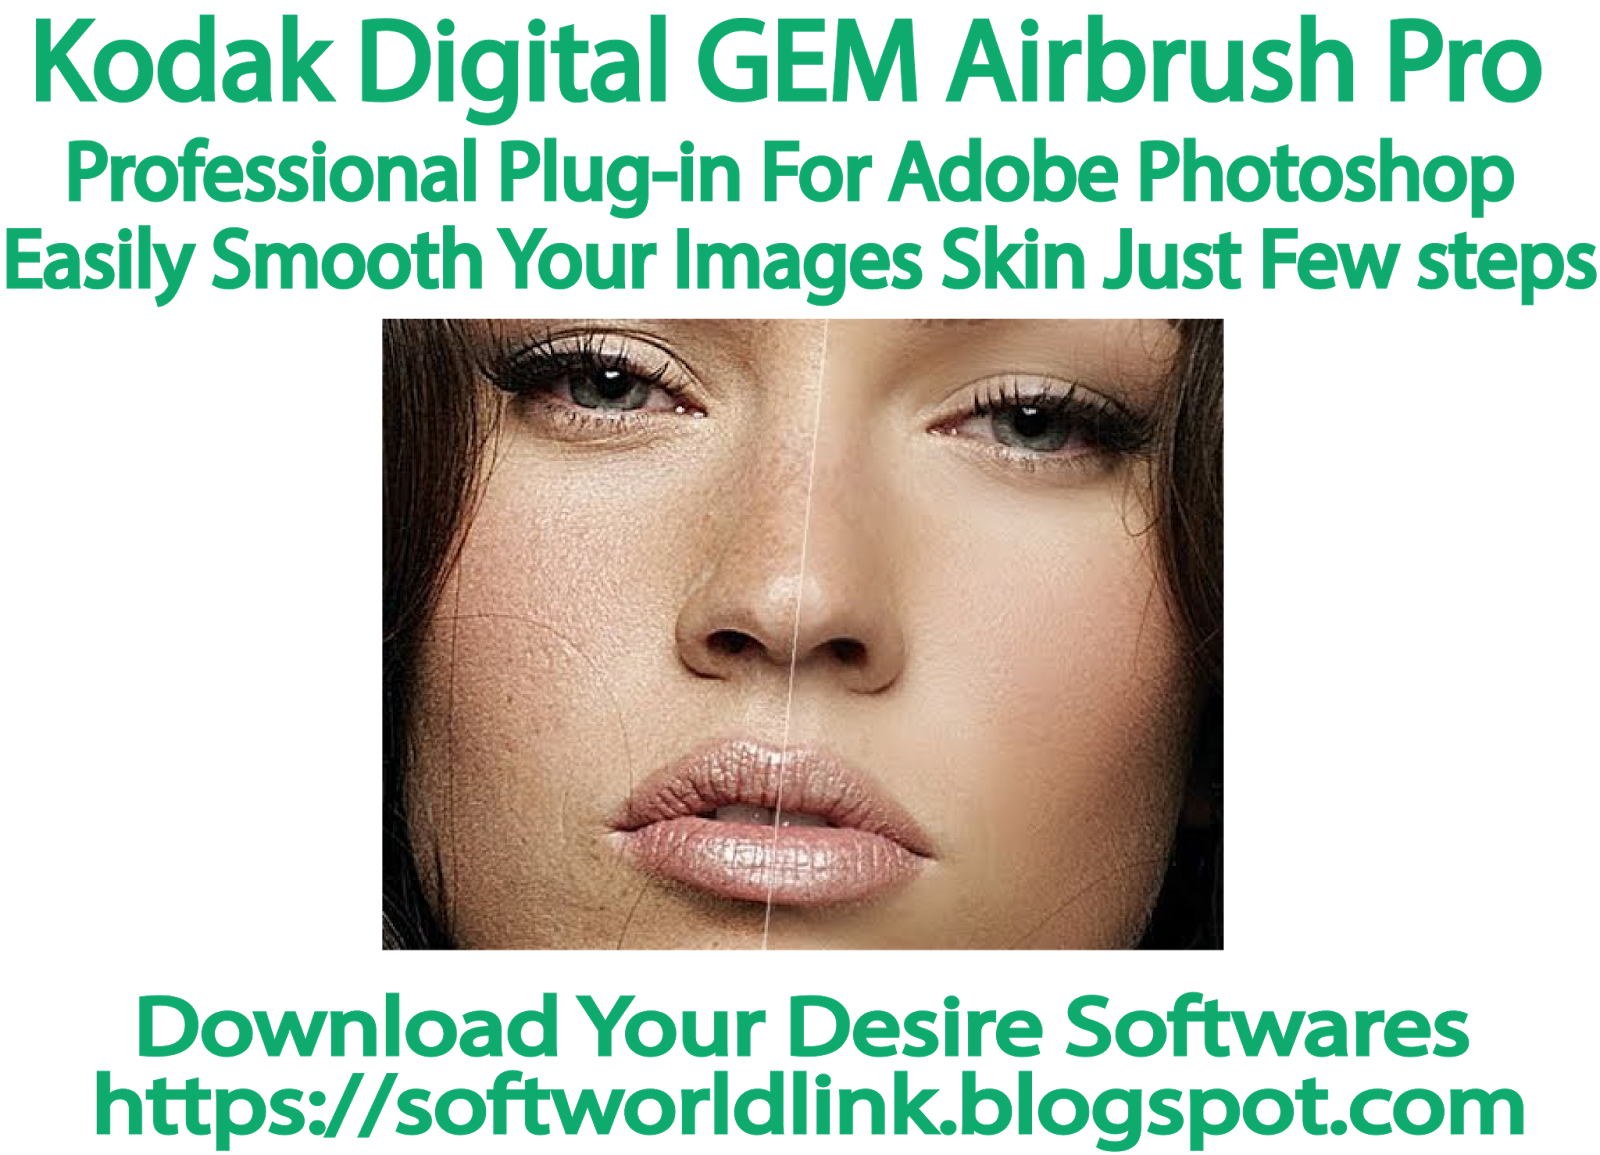 Kodak Digital GEM Airbrush Pro-Professional plug-in for adobe